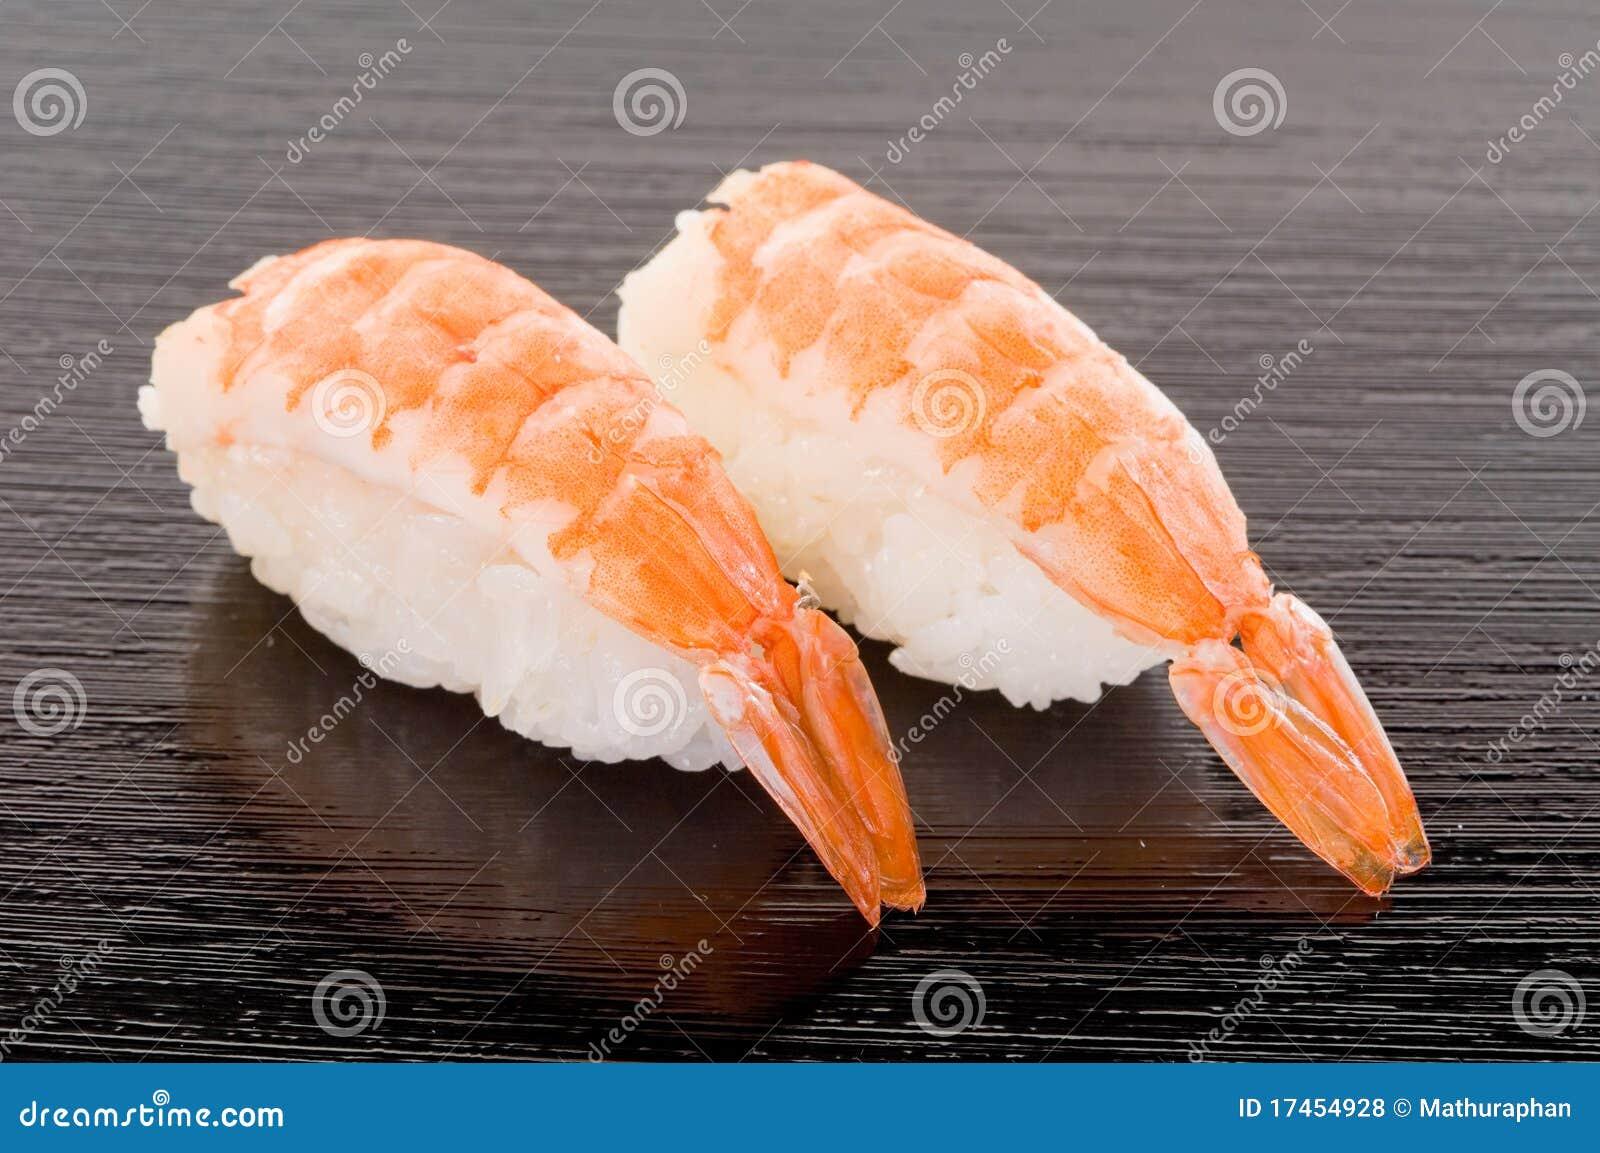 Ebi Sushi Stock Photo Image Of Kitchen Avocado Calamari 17454928